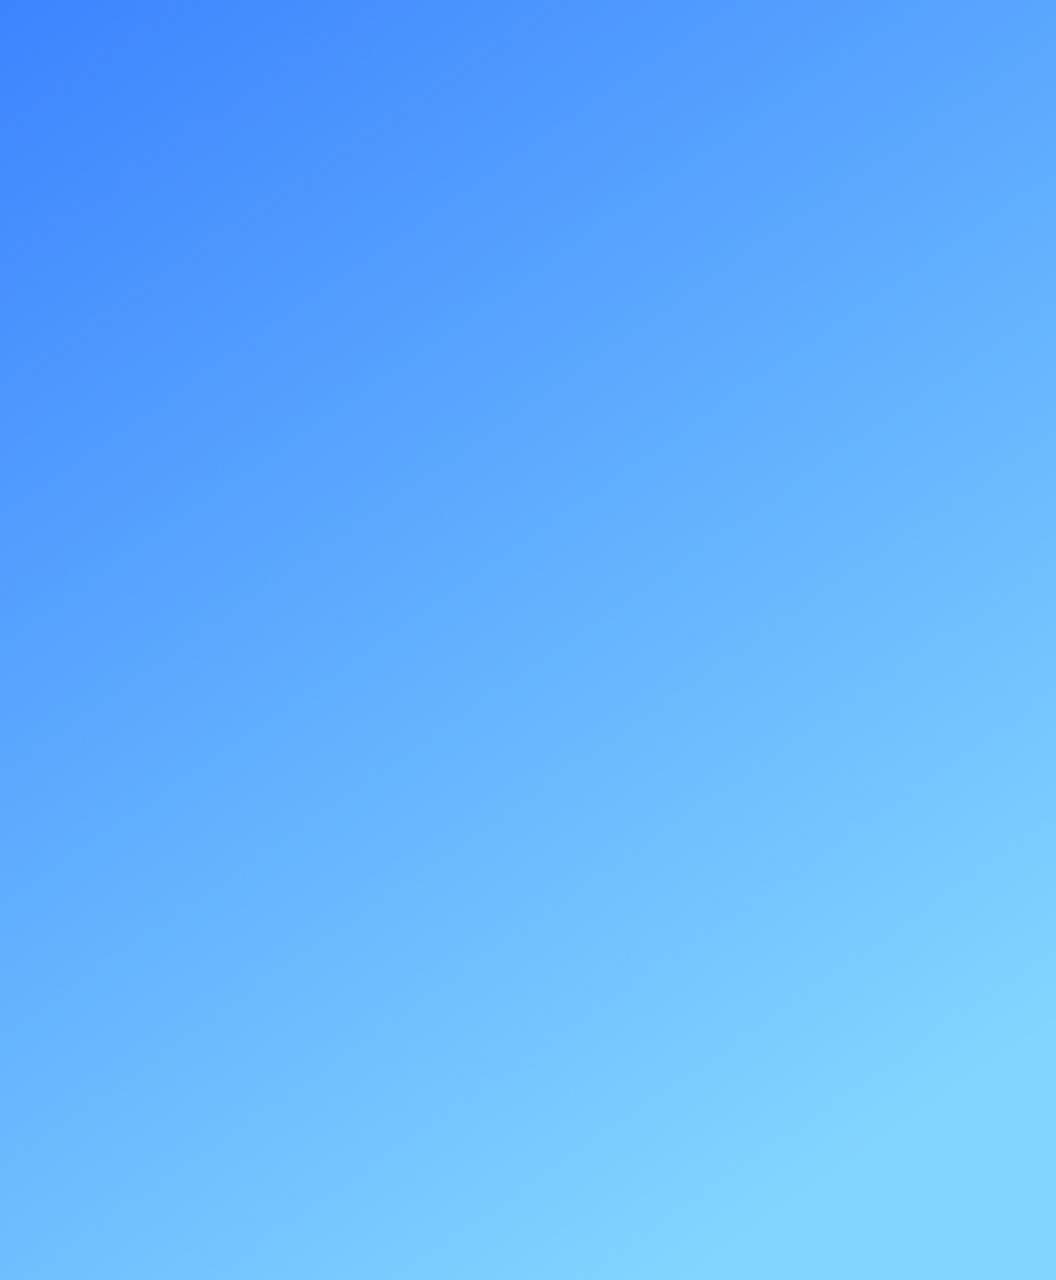 Soft Blue iPhoneX